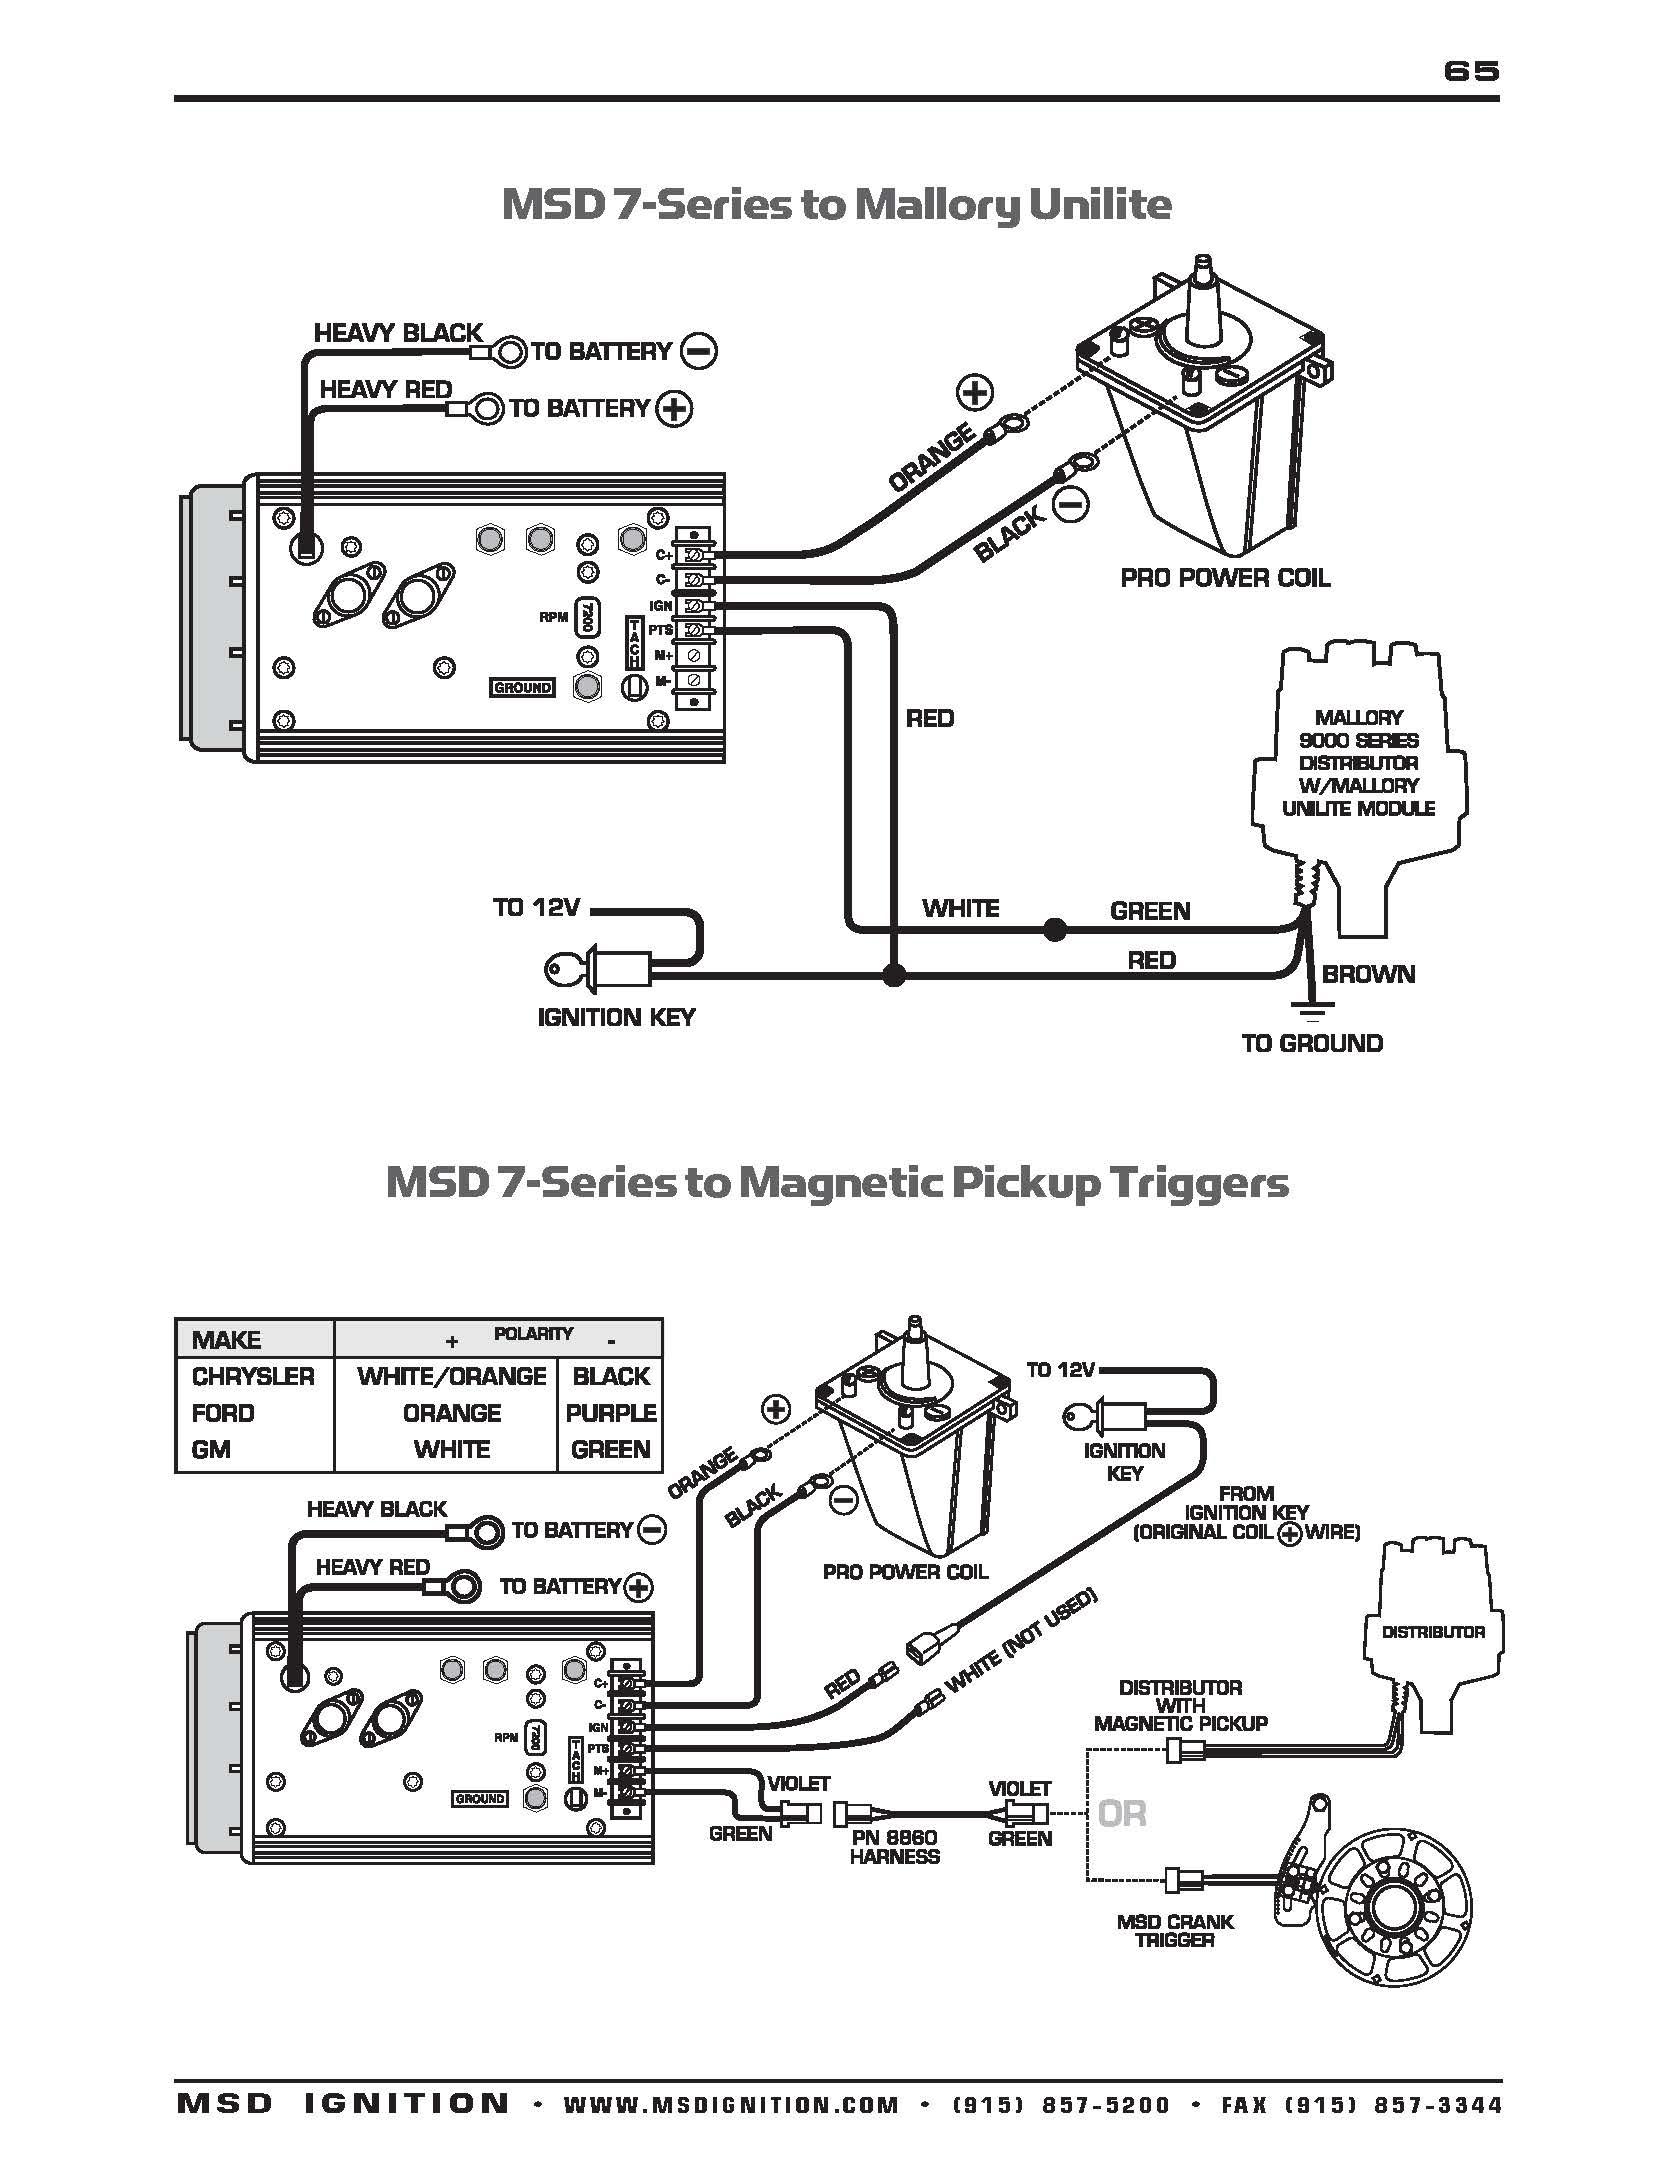 Mallory Unilite Wiring Diagram Sbc – Wiring Diagram Data Oreo – Ignition Wiring Diagram Chevy 350